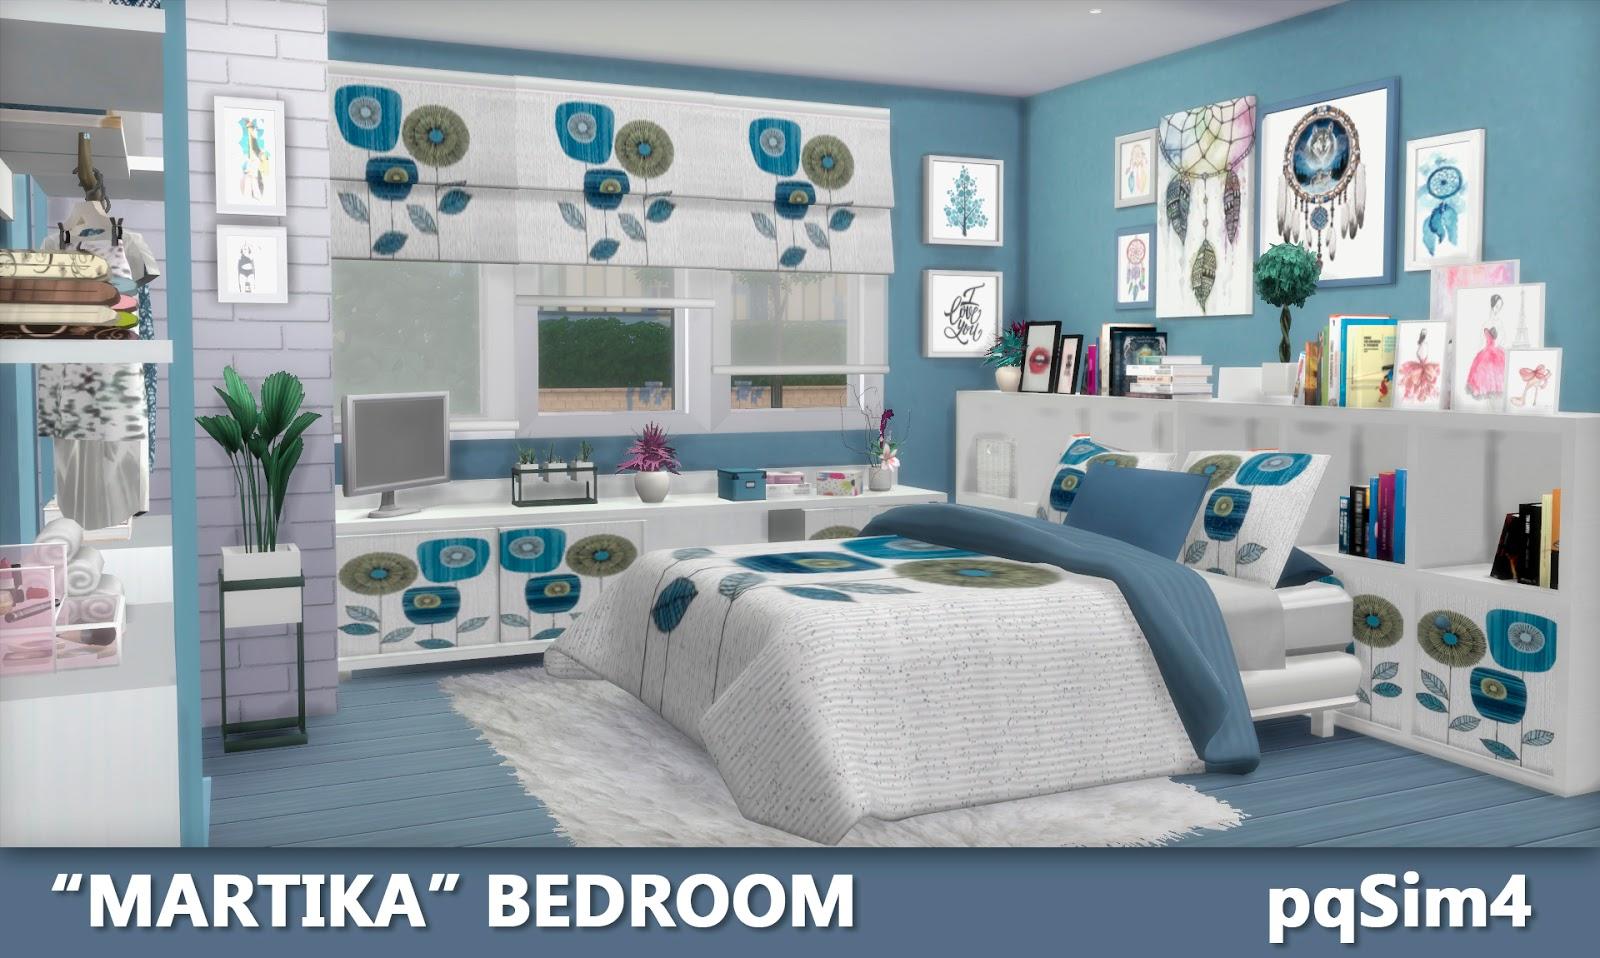 Sims Bedroom Martika Bedroom Sims 4 Custom Content